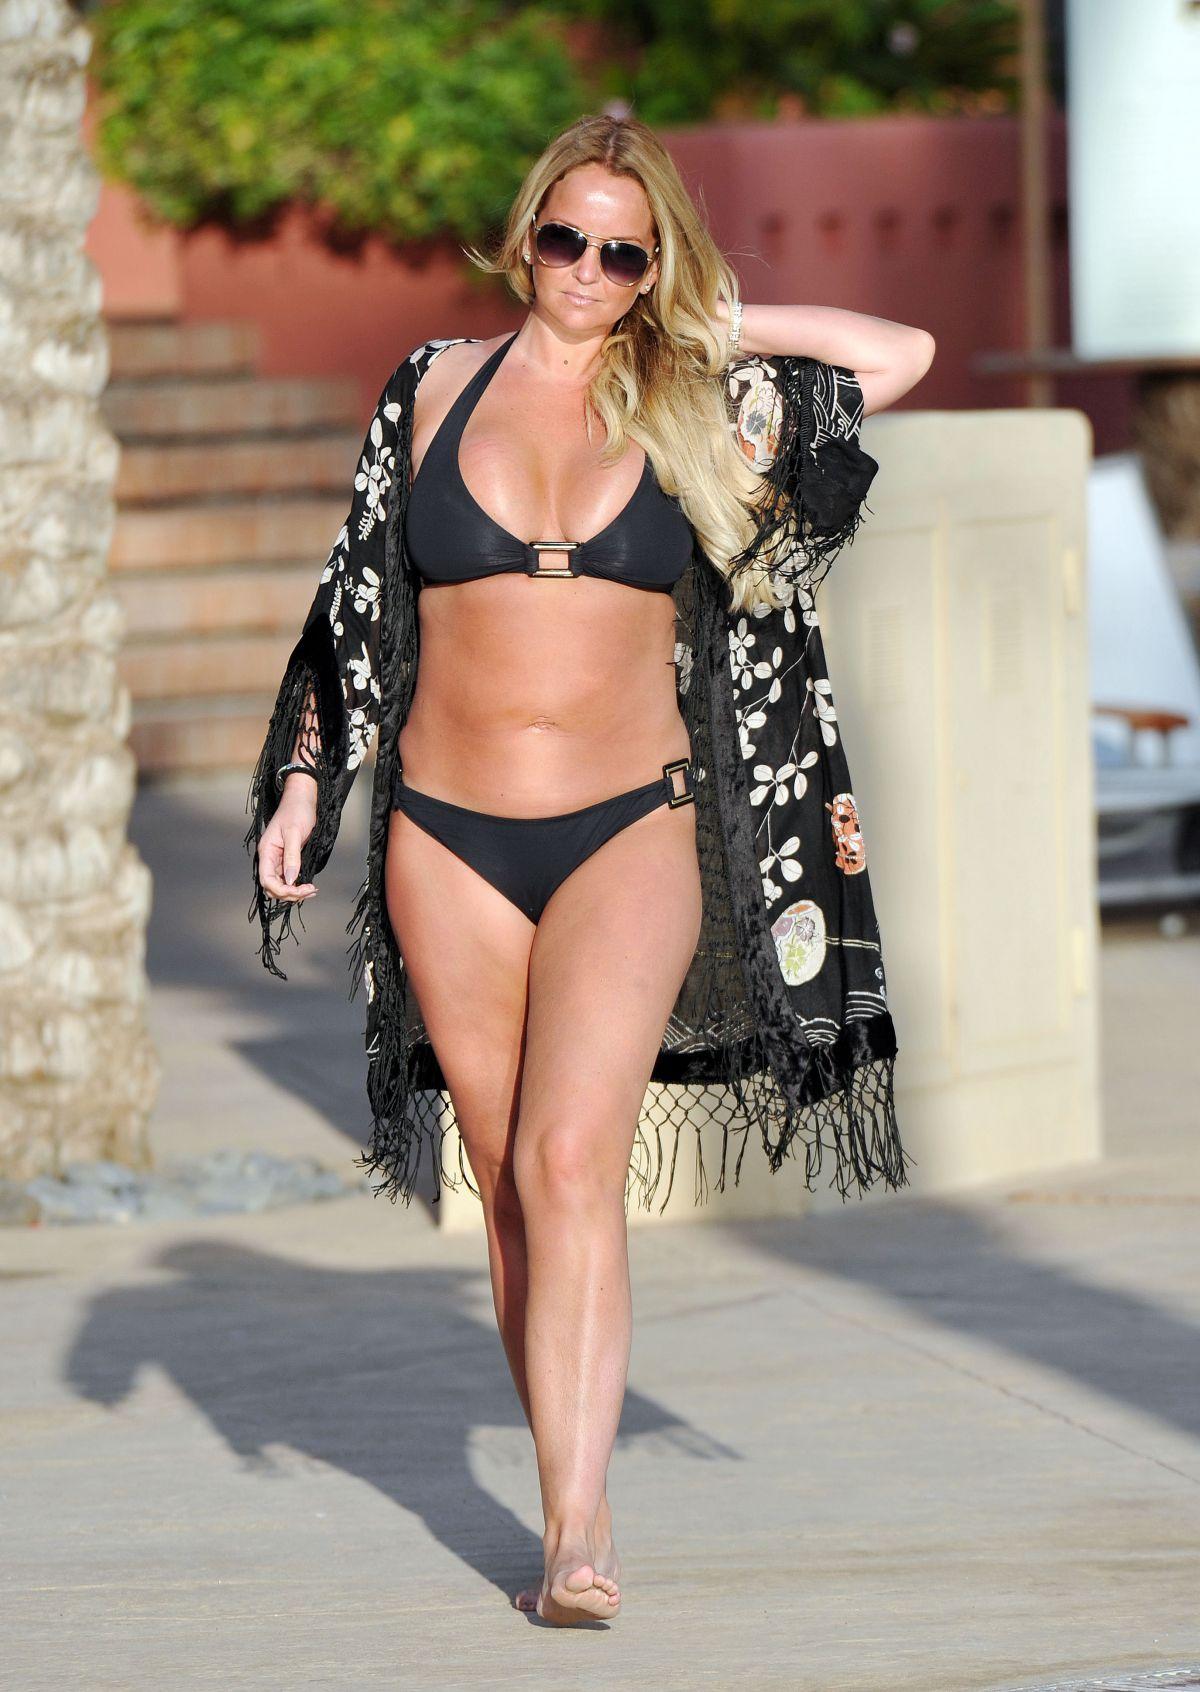 Jennifer ellison bikini phrase, matchless)))